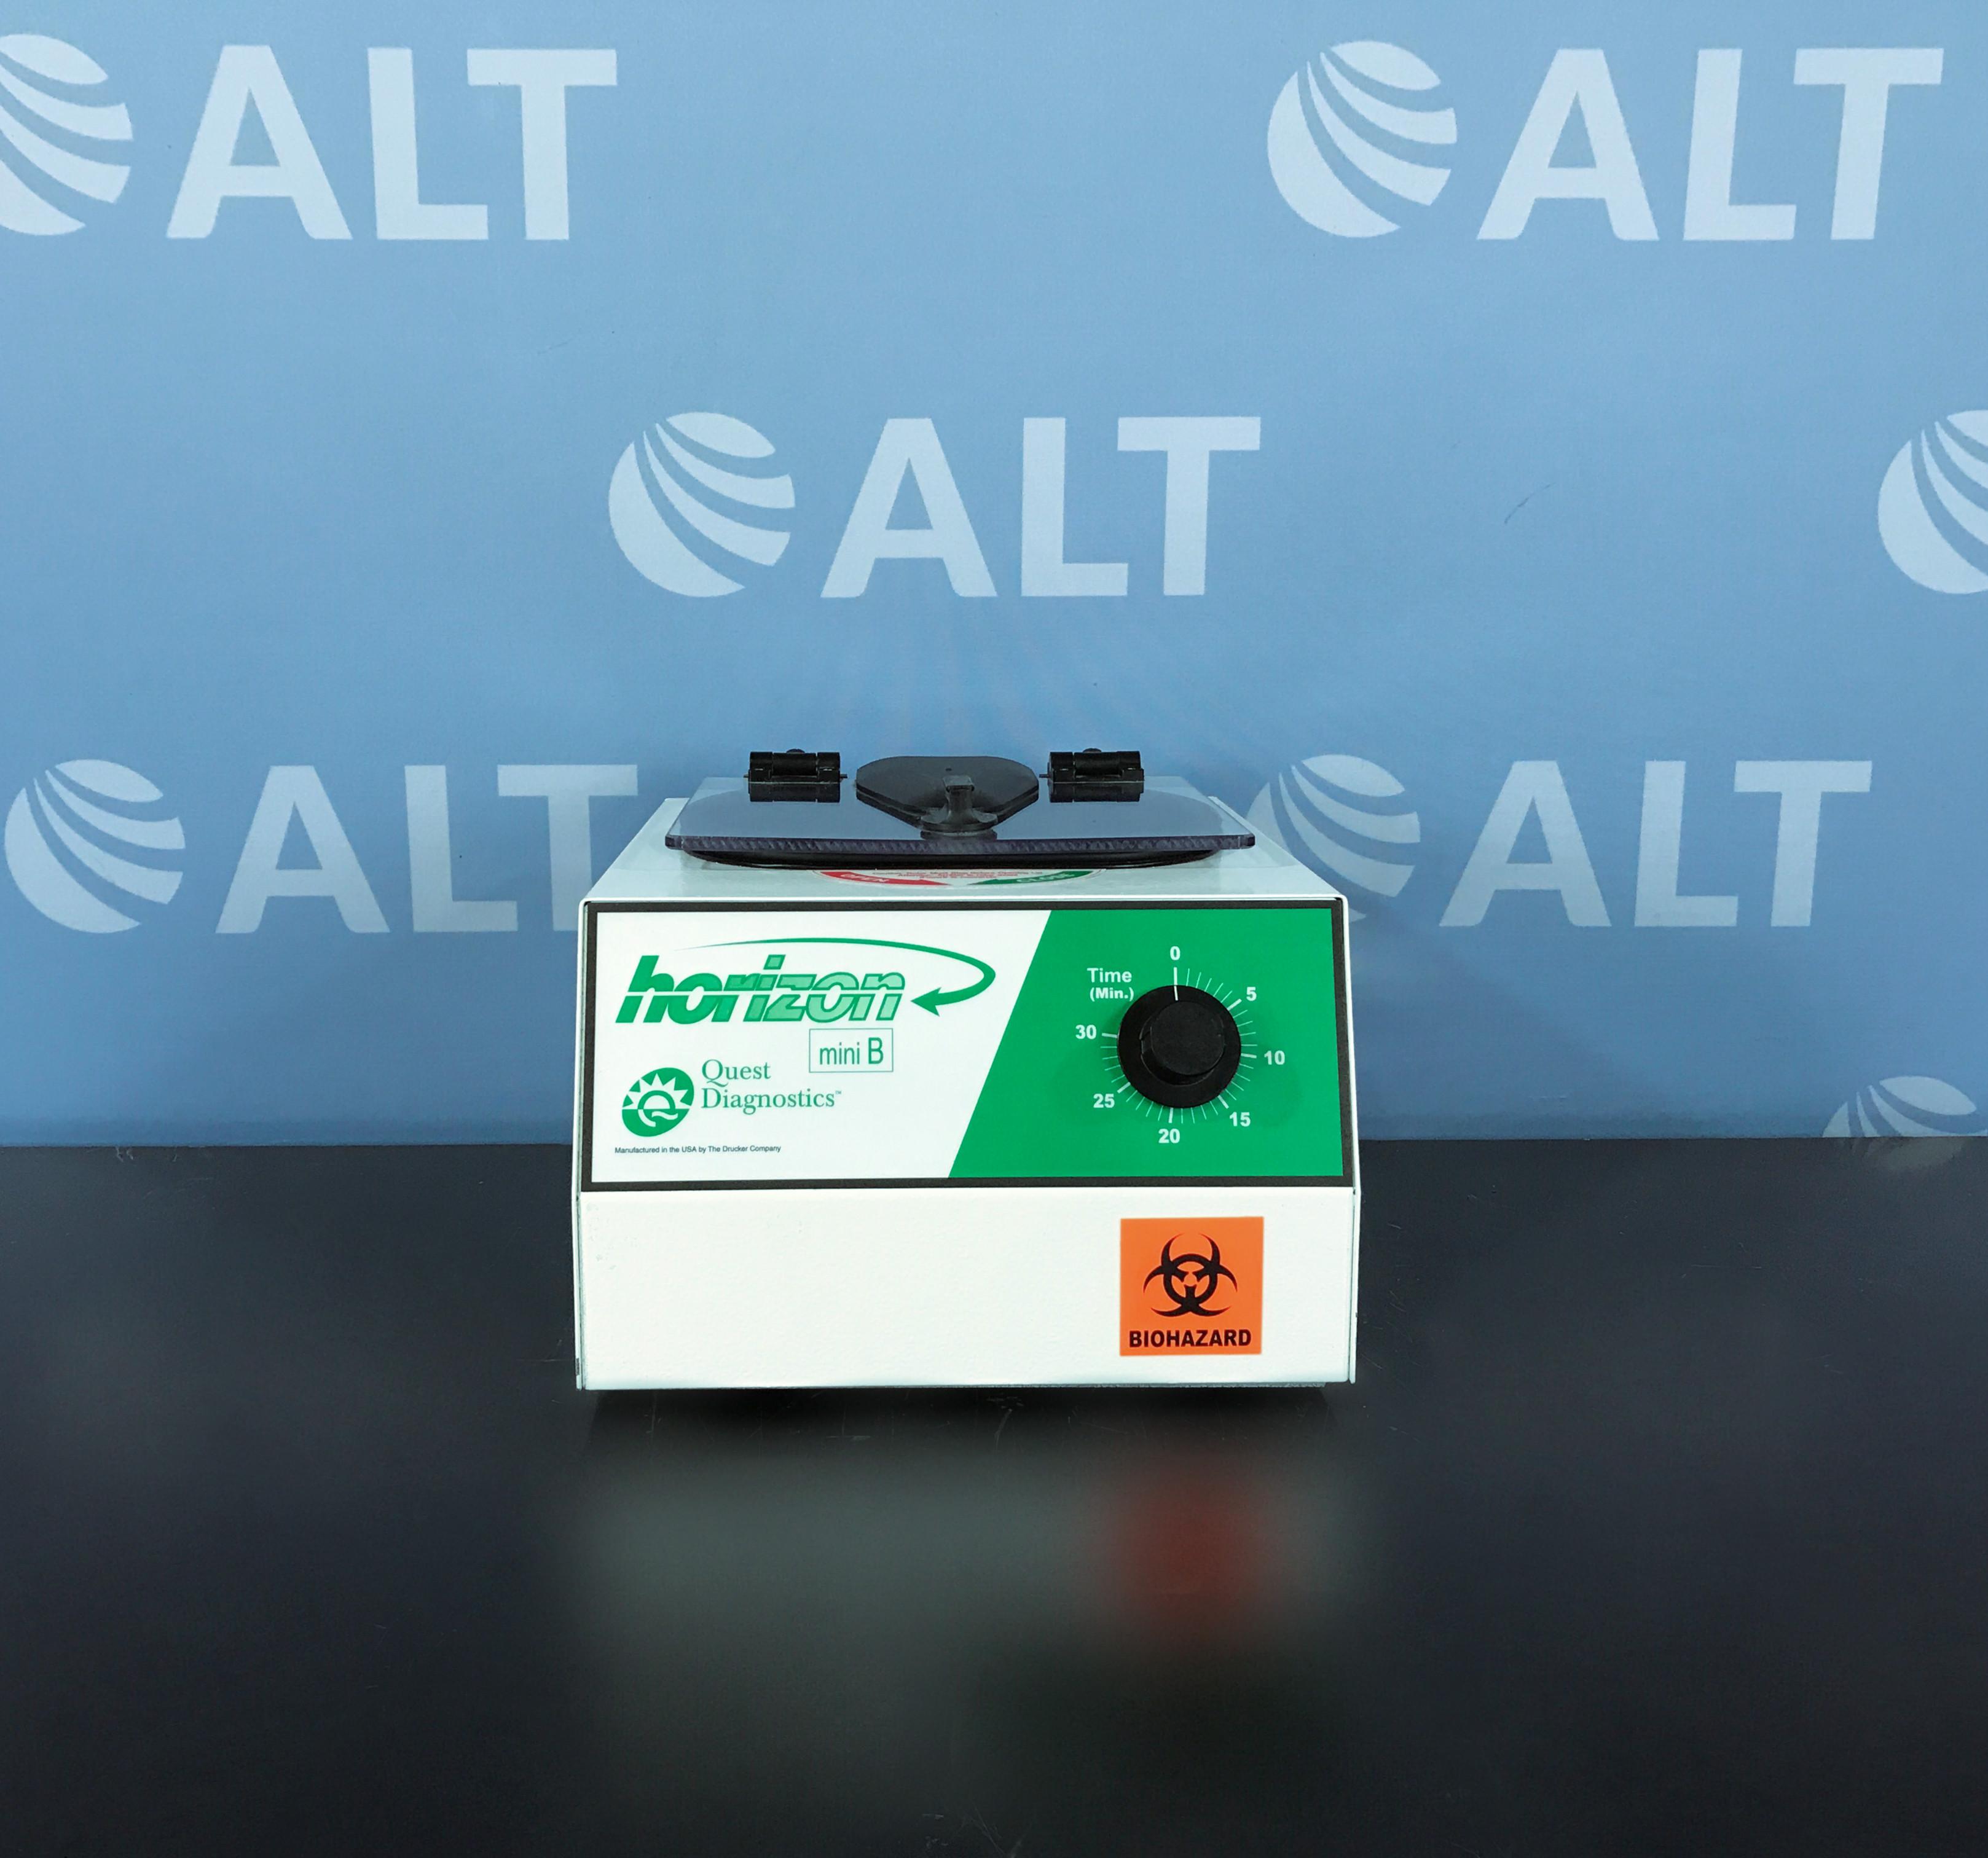 Drucker Horizon MiniB Centrifuge  Image